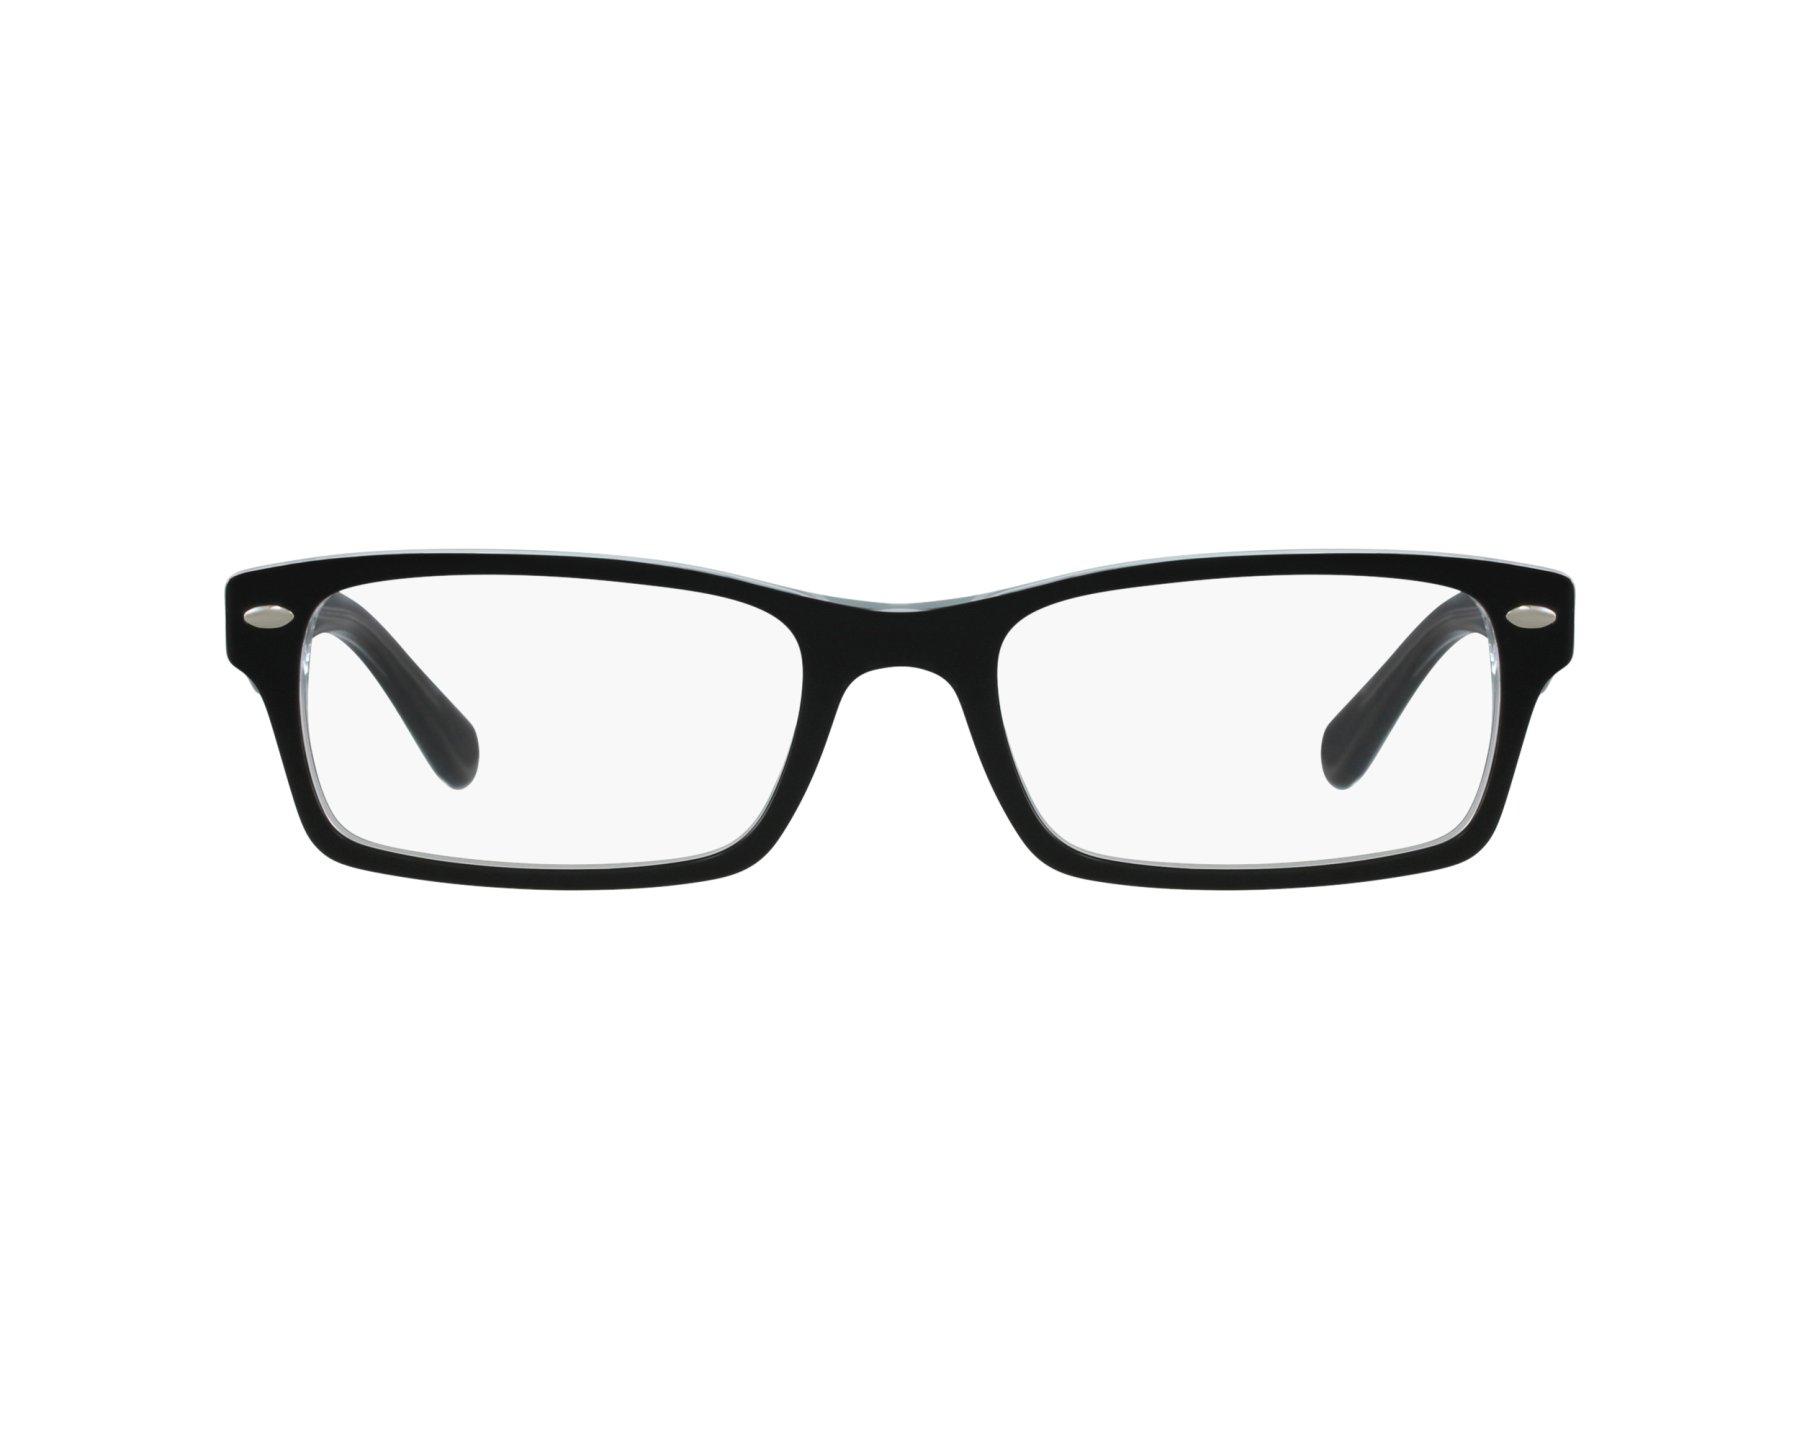 5a815f5f56 eyeglasses Ray-Ban RX-5228 5057 50-17 Havana profile view